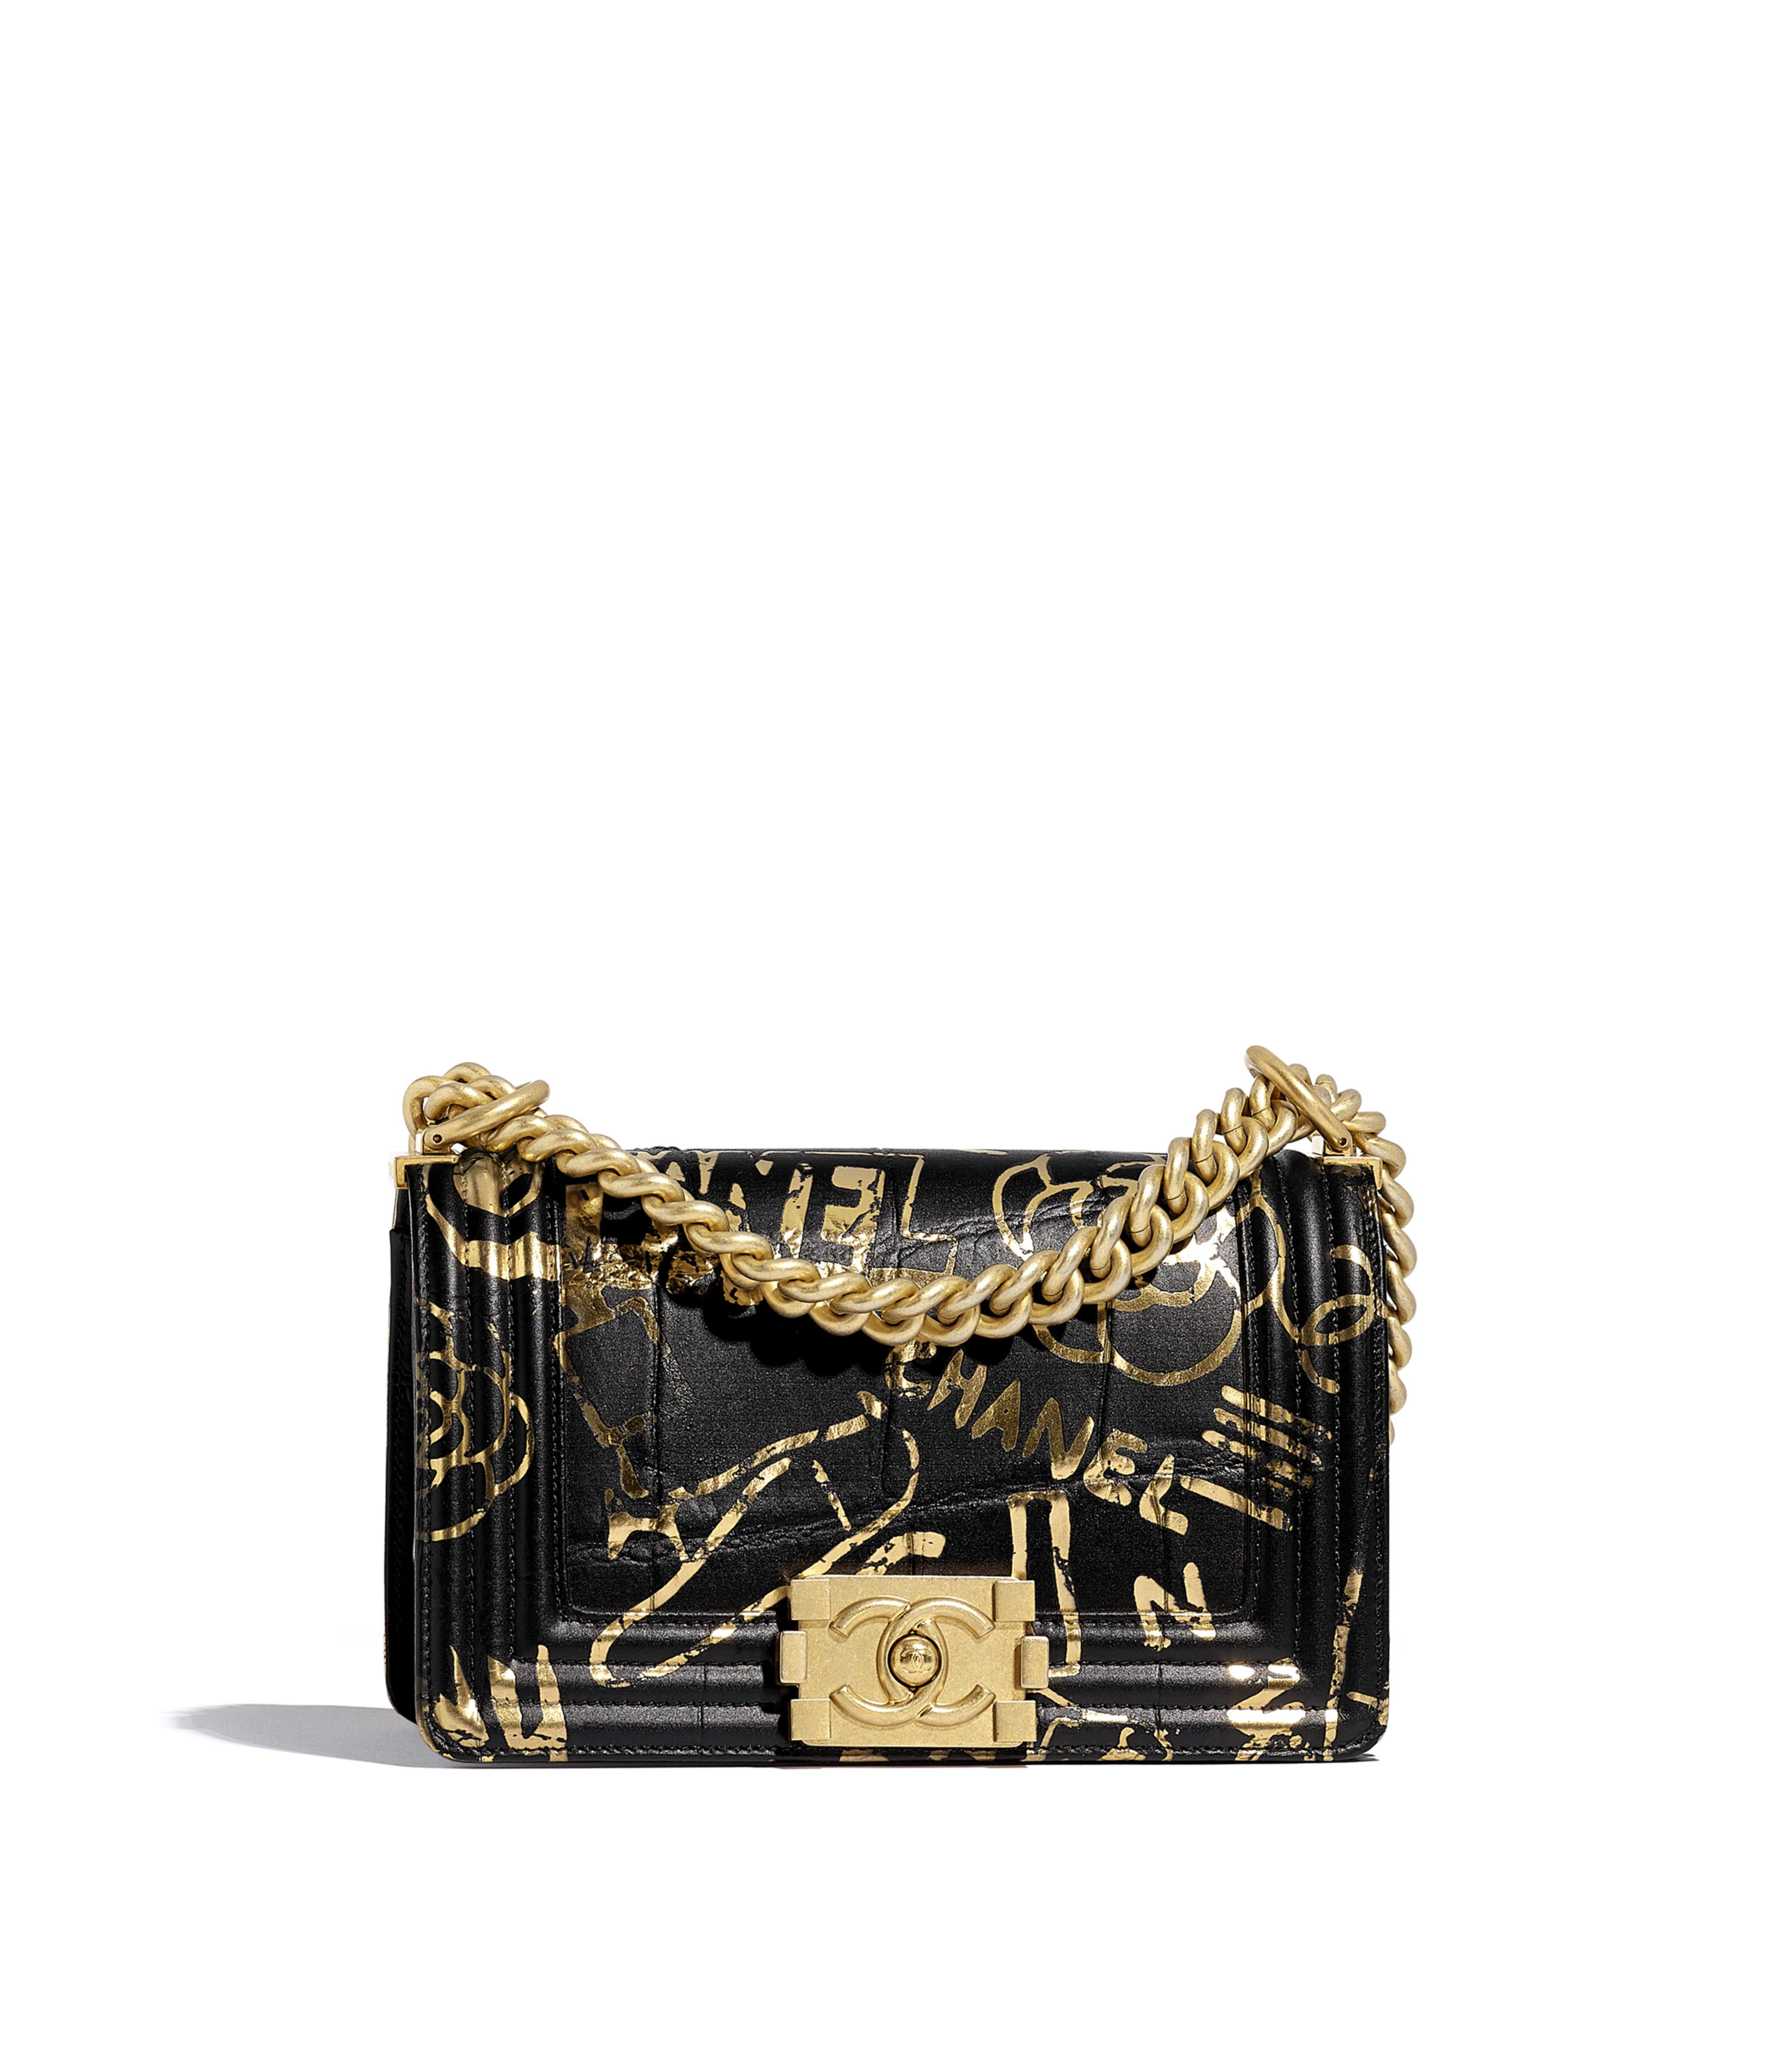 32185c6e BOY CHANEL - Handbags   CHANEL